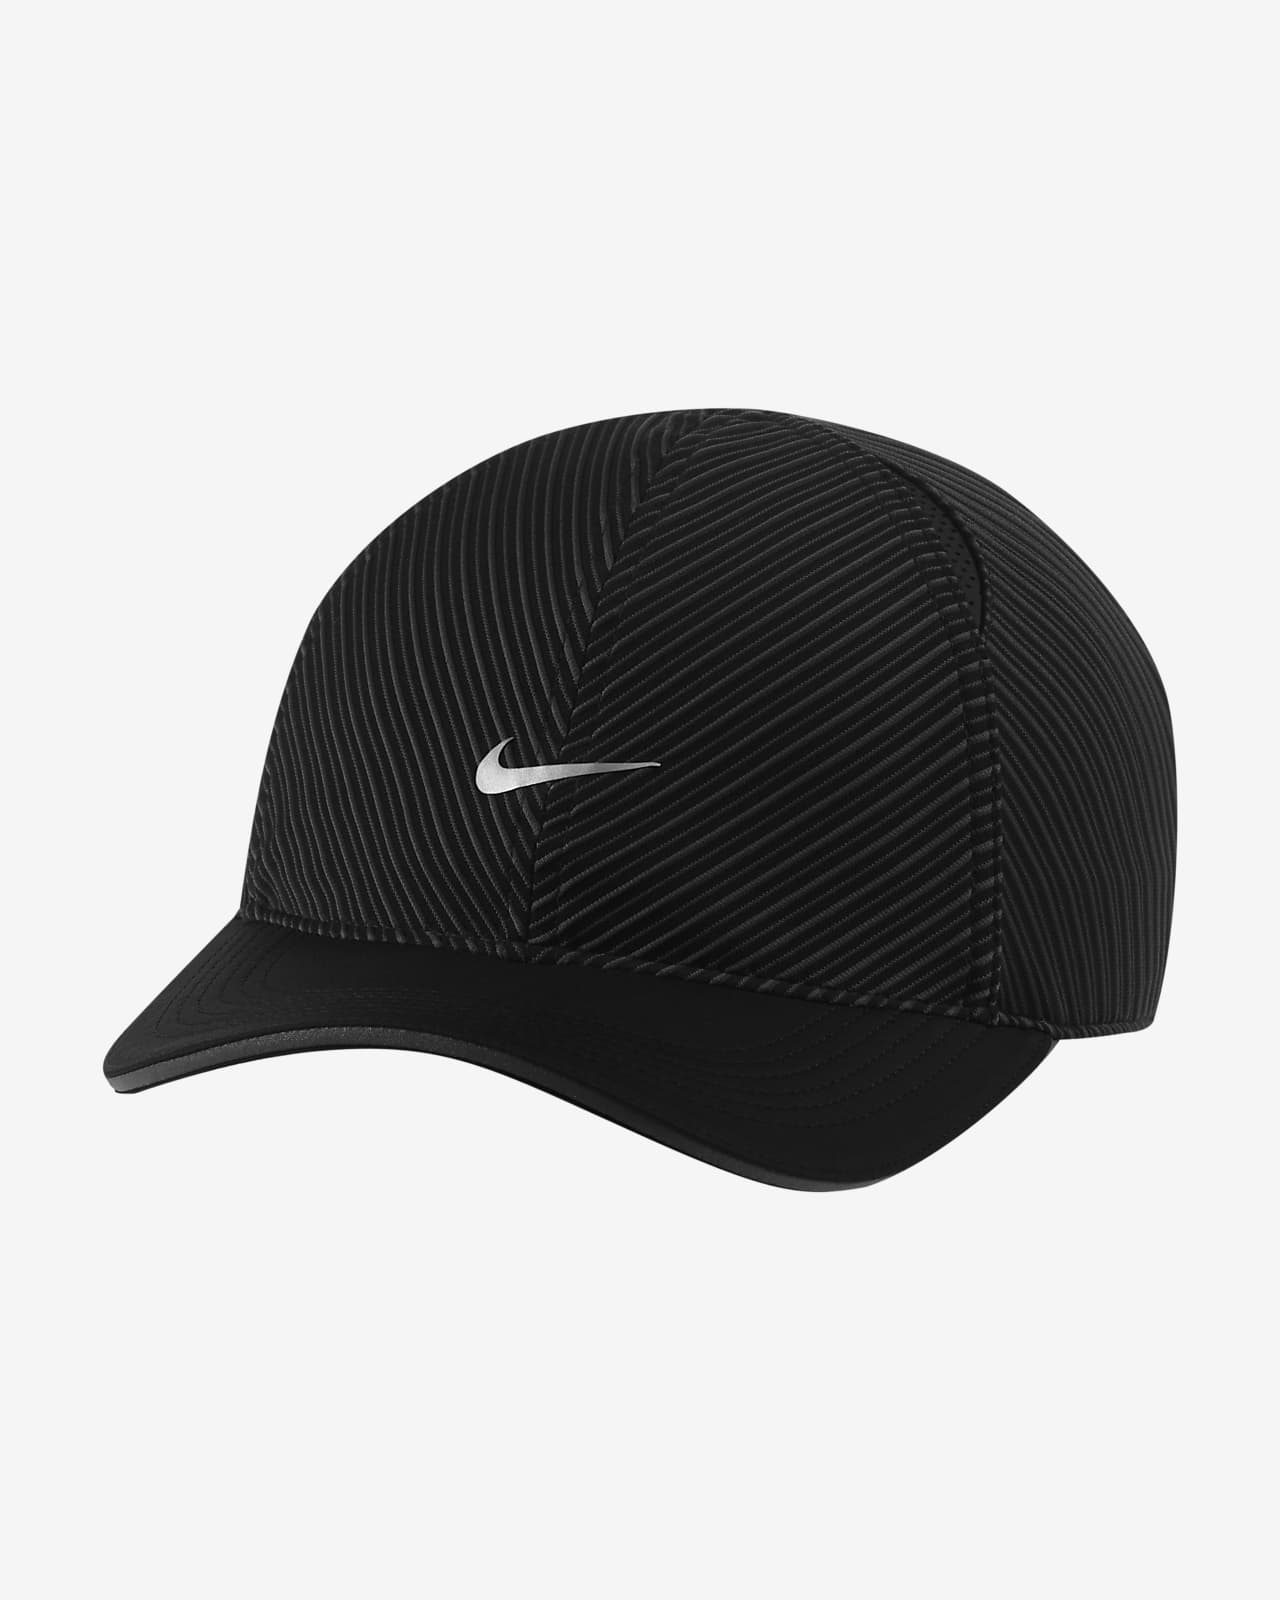 Nike Dri-FIT AeroBill Featherlight Knit Running Cap